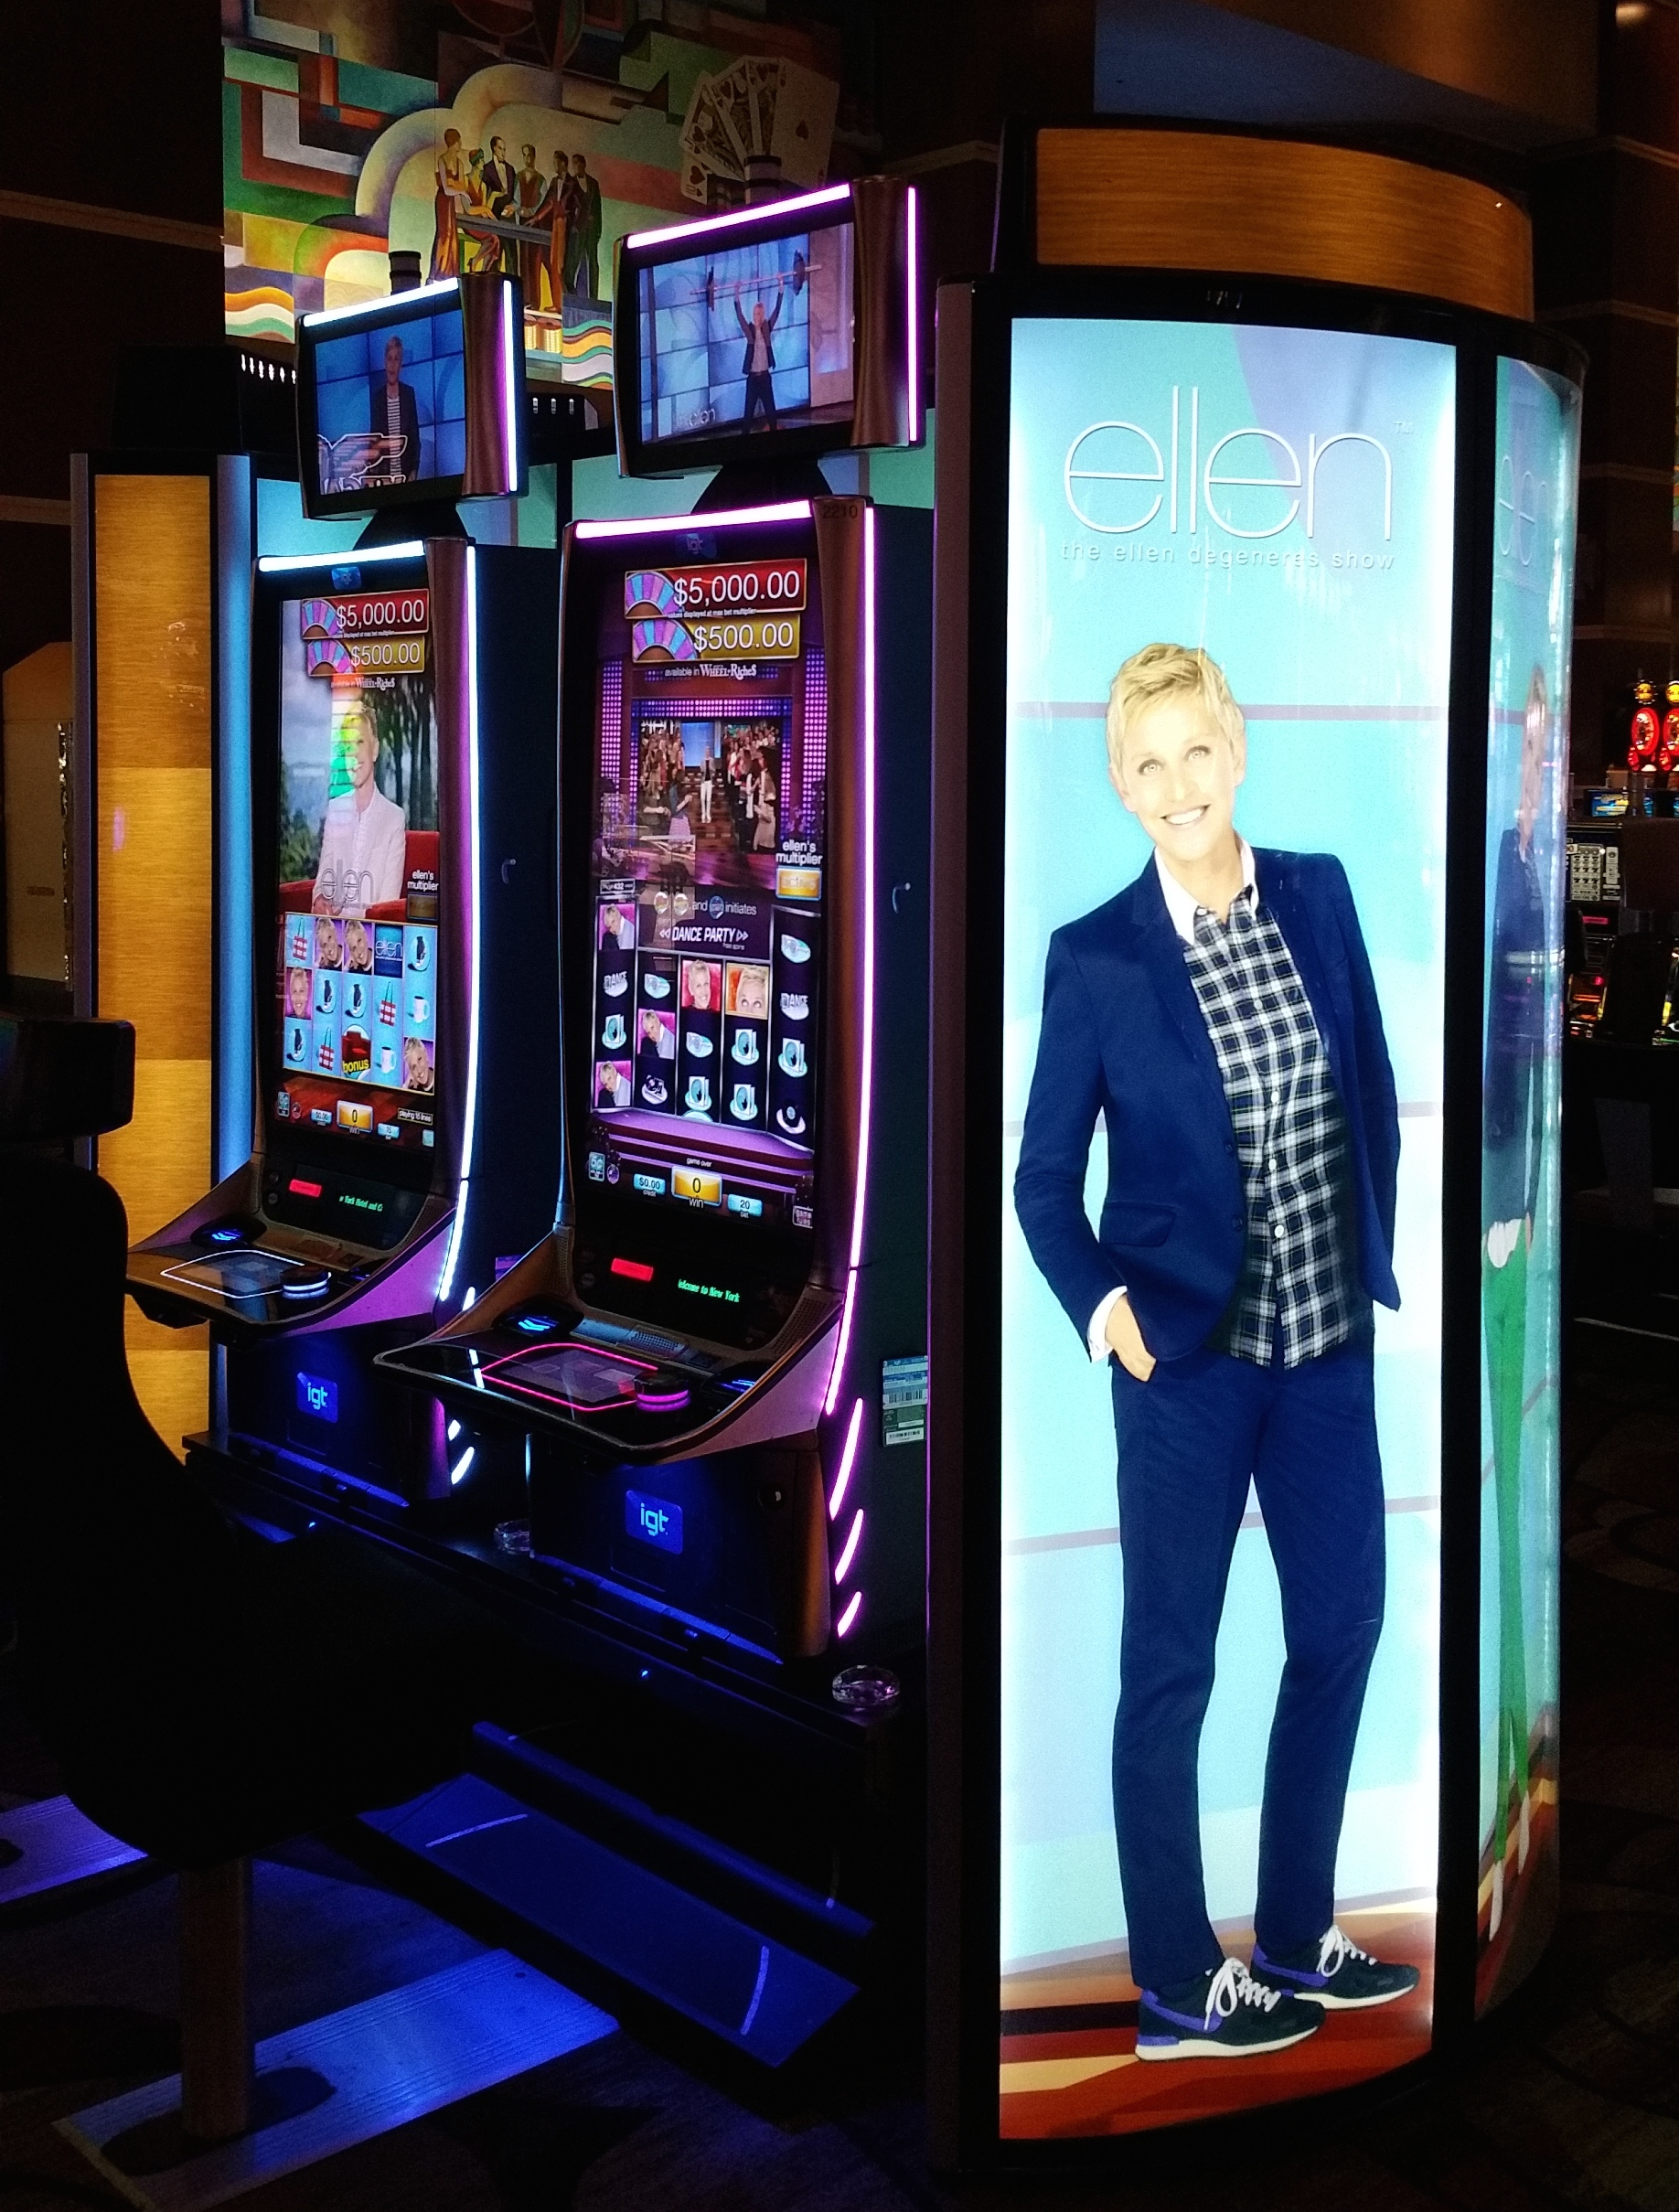 Ellen has her own slot machine...?